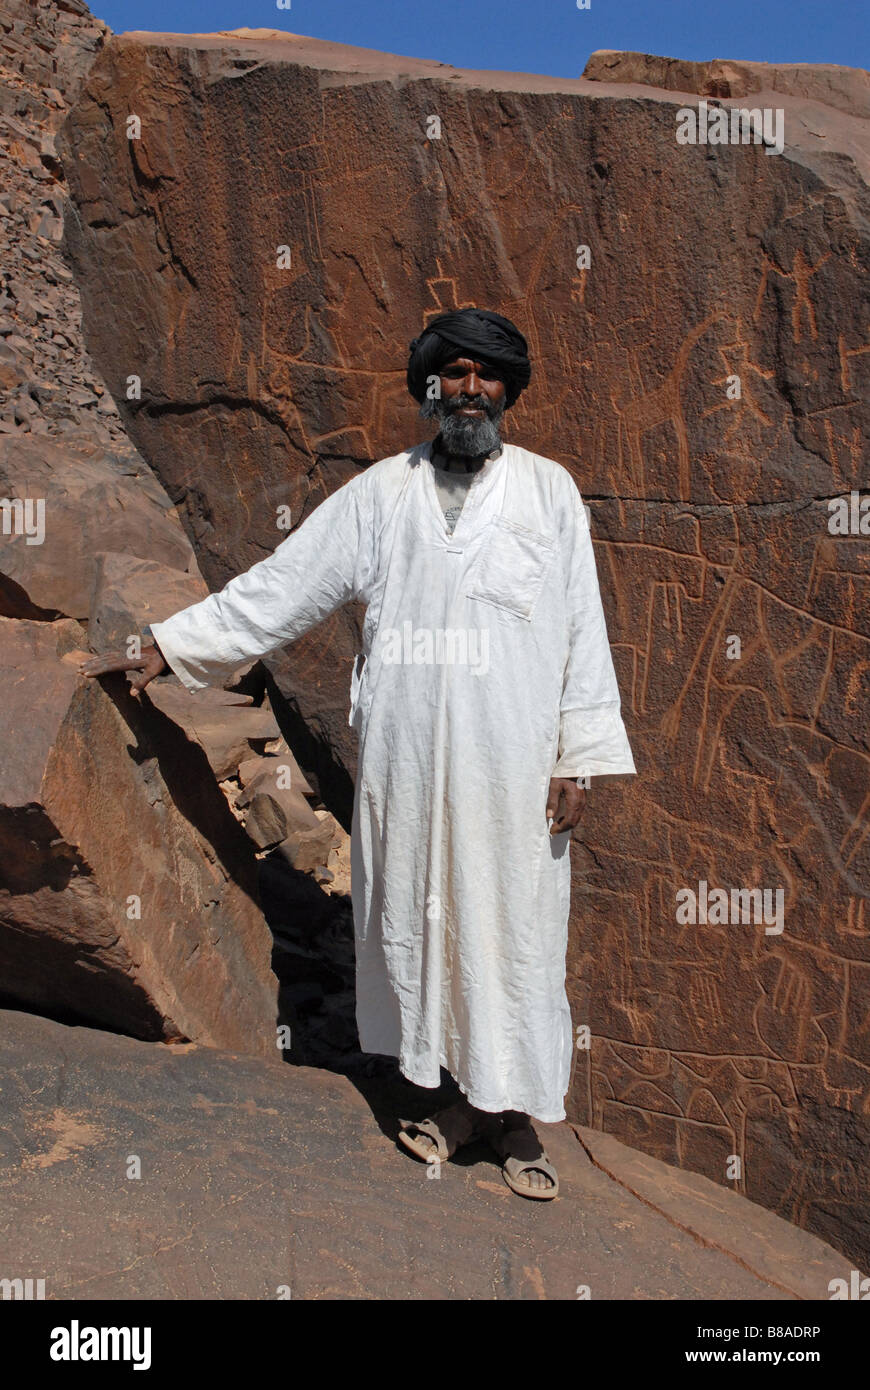 El Ghelouiya site prehistorical in the Sahara desert Mauritania - Stock Image